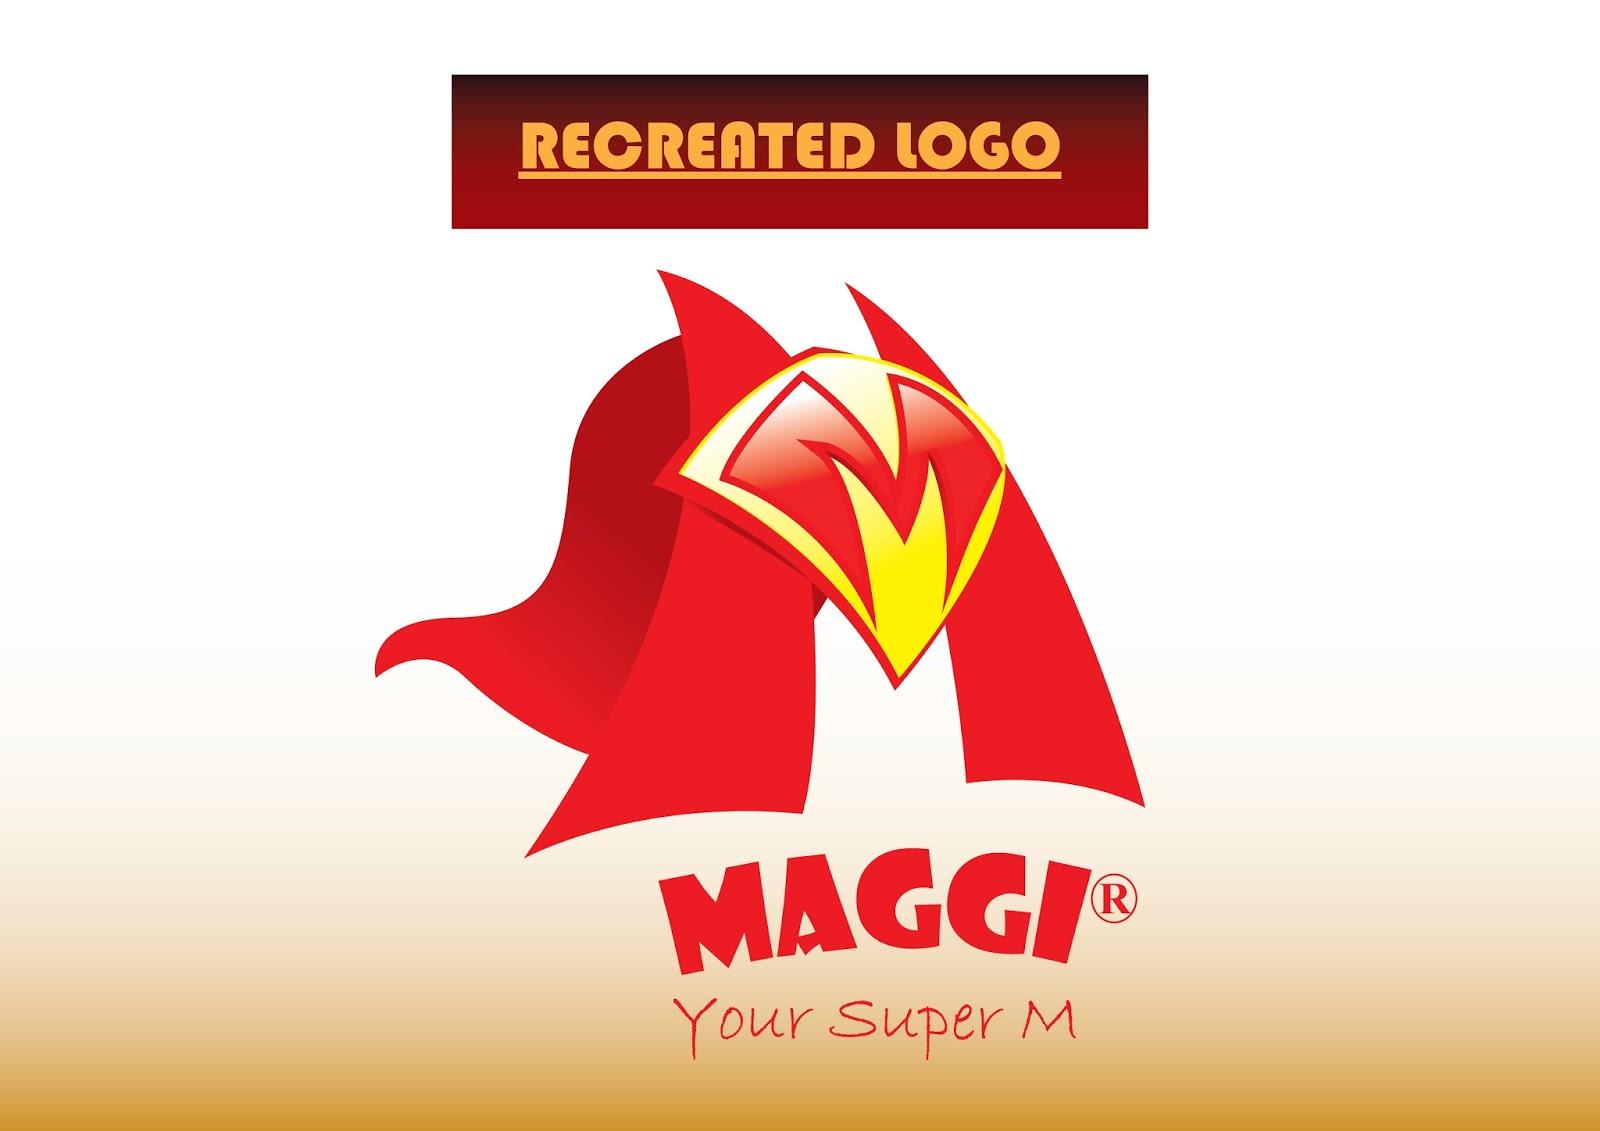 Subhajit Bhattacharjee: RECREATED MAGGI LOGO FROM ORIGINAL LOGO BY ... | {Maggi logo 57}